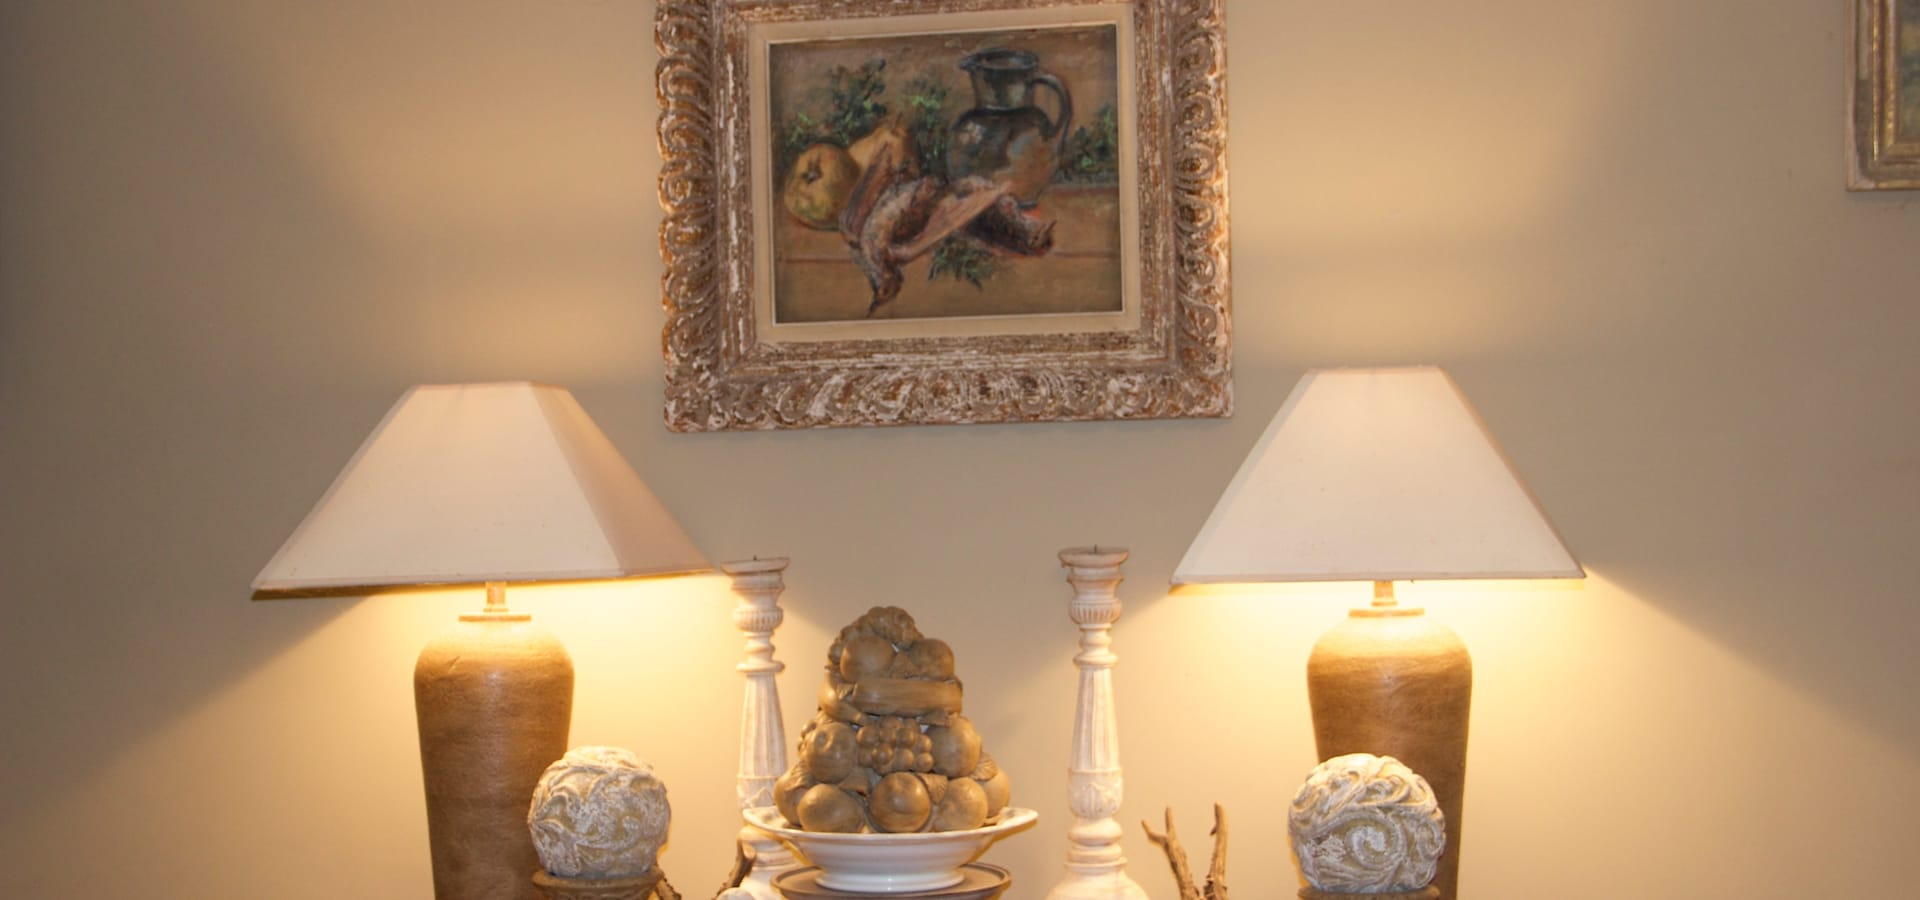 Sybille Alliot Deco and Design Interieur